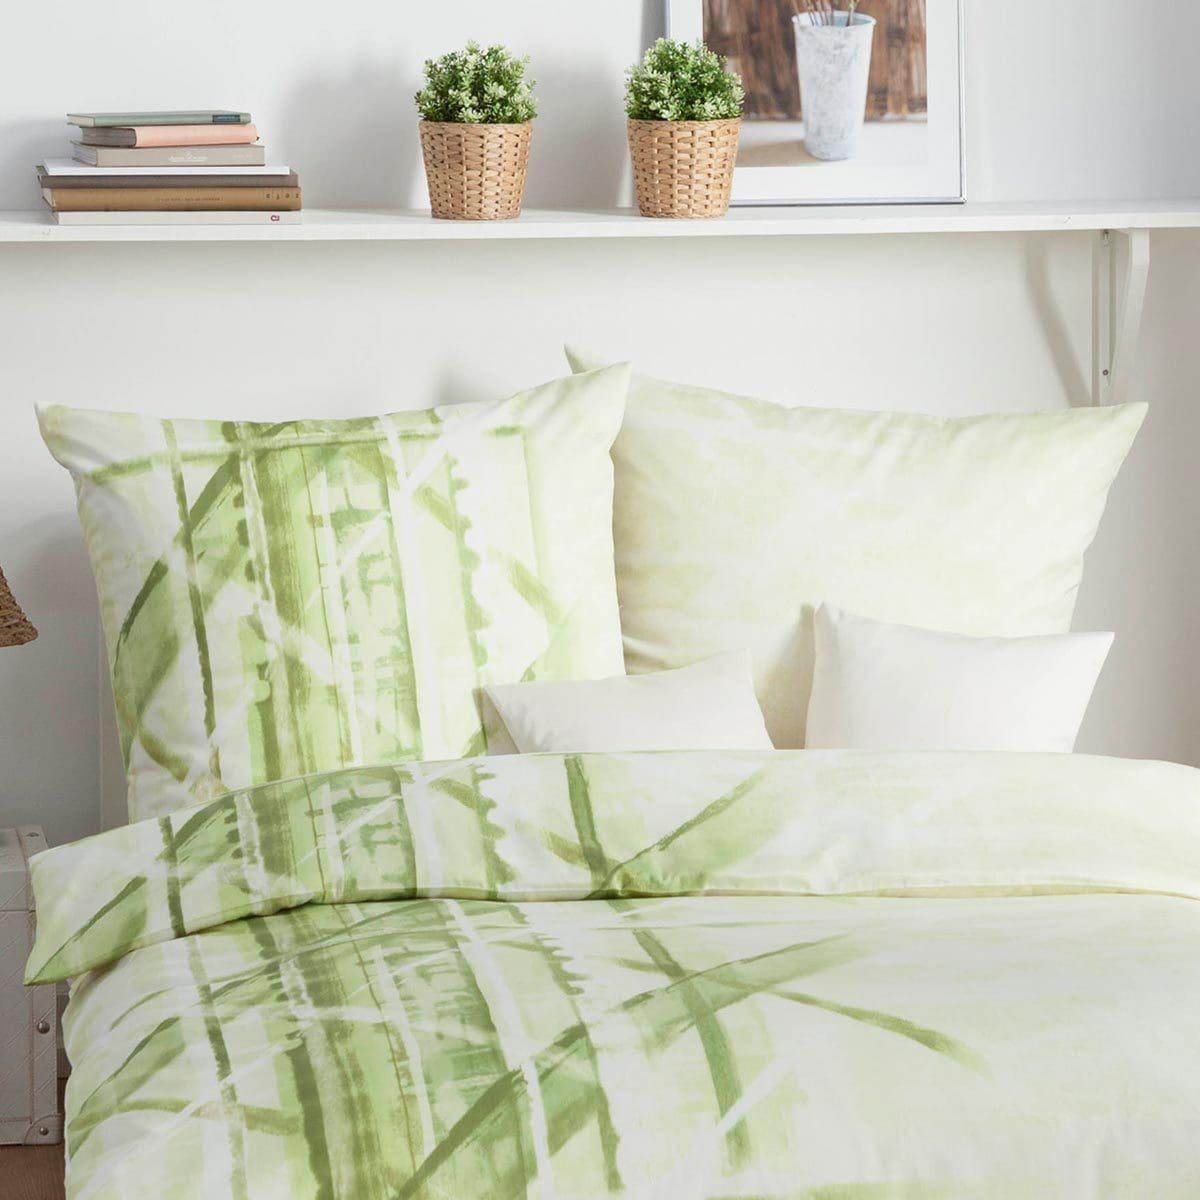 kaeppel mako satin bettw sche view gr n g nstig online kaufen bei bettwaren shop. Black Bedroom Furniture Sets. Home Design Ideas